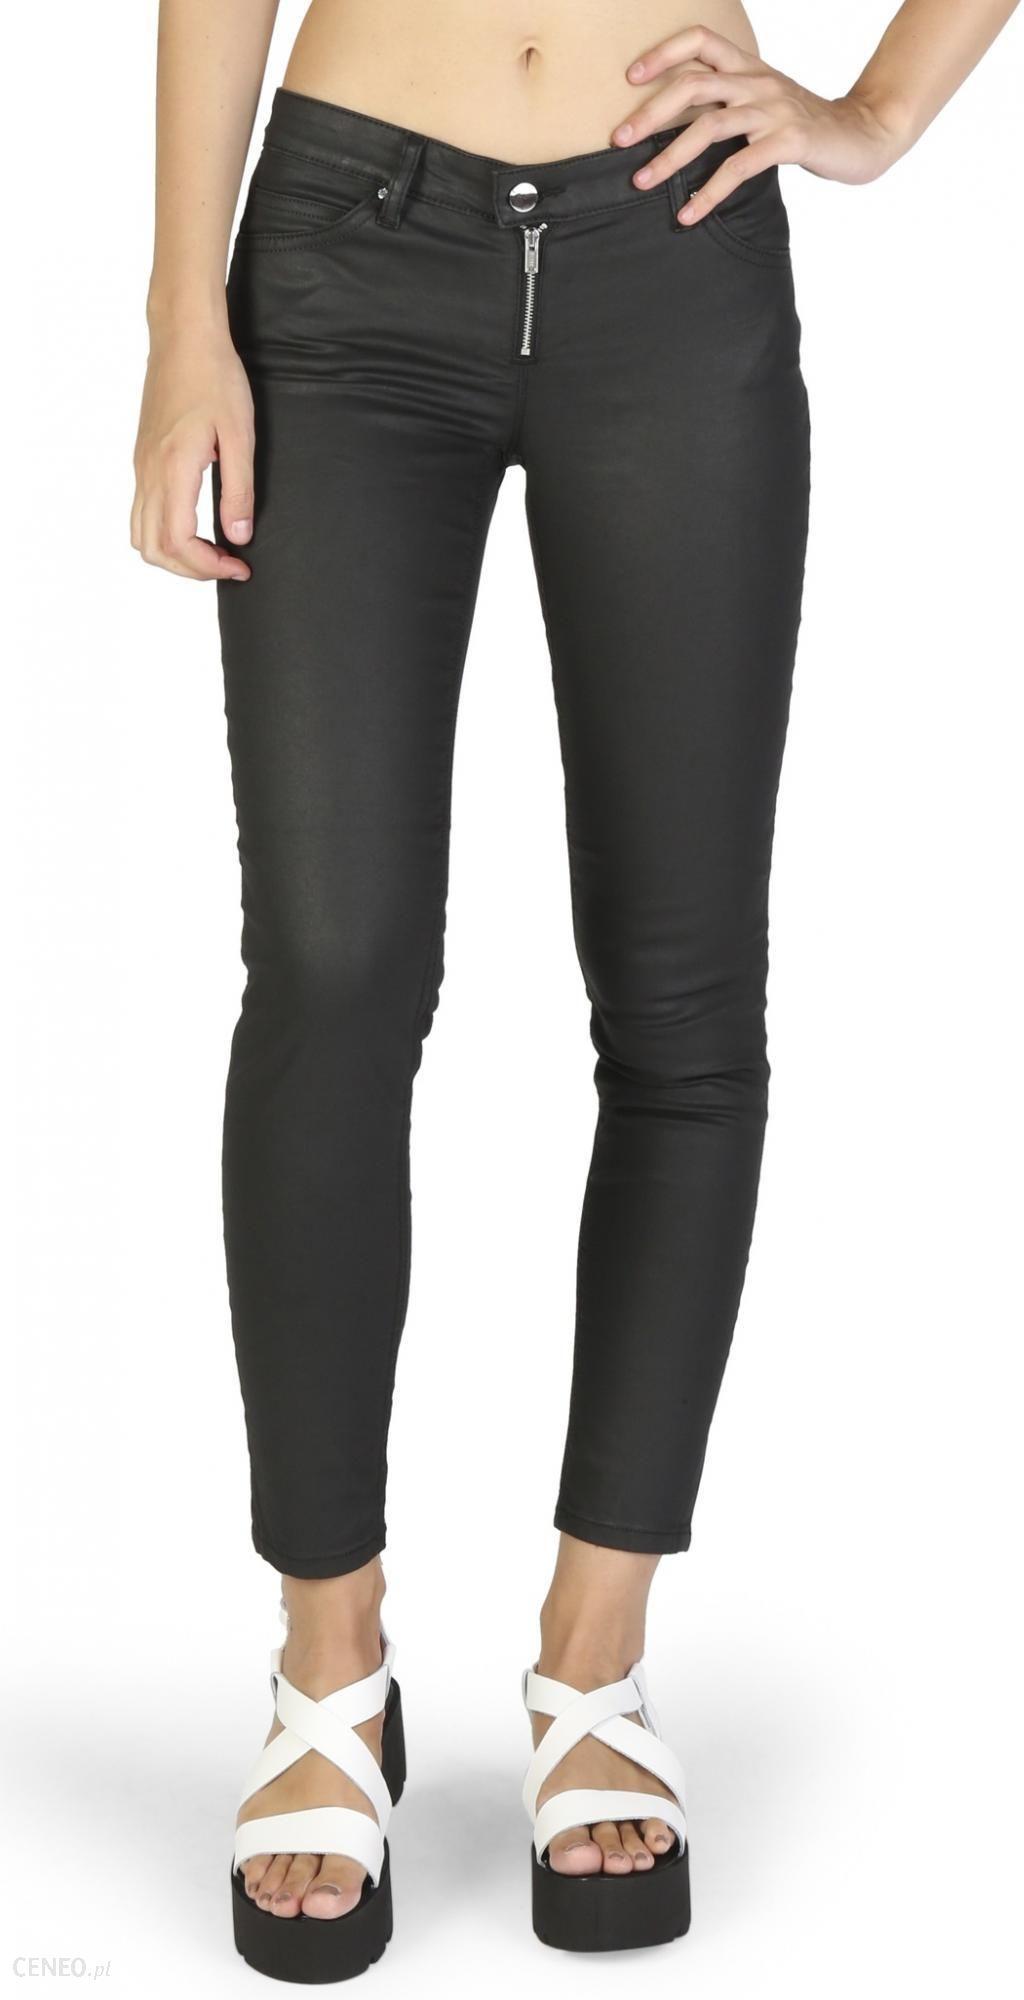 56bd80f6d9169 Guess spodnie damskie 26 czarny